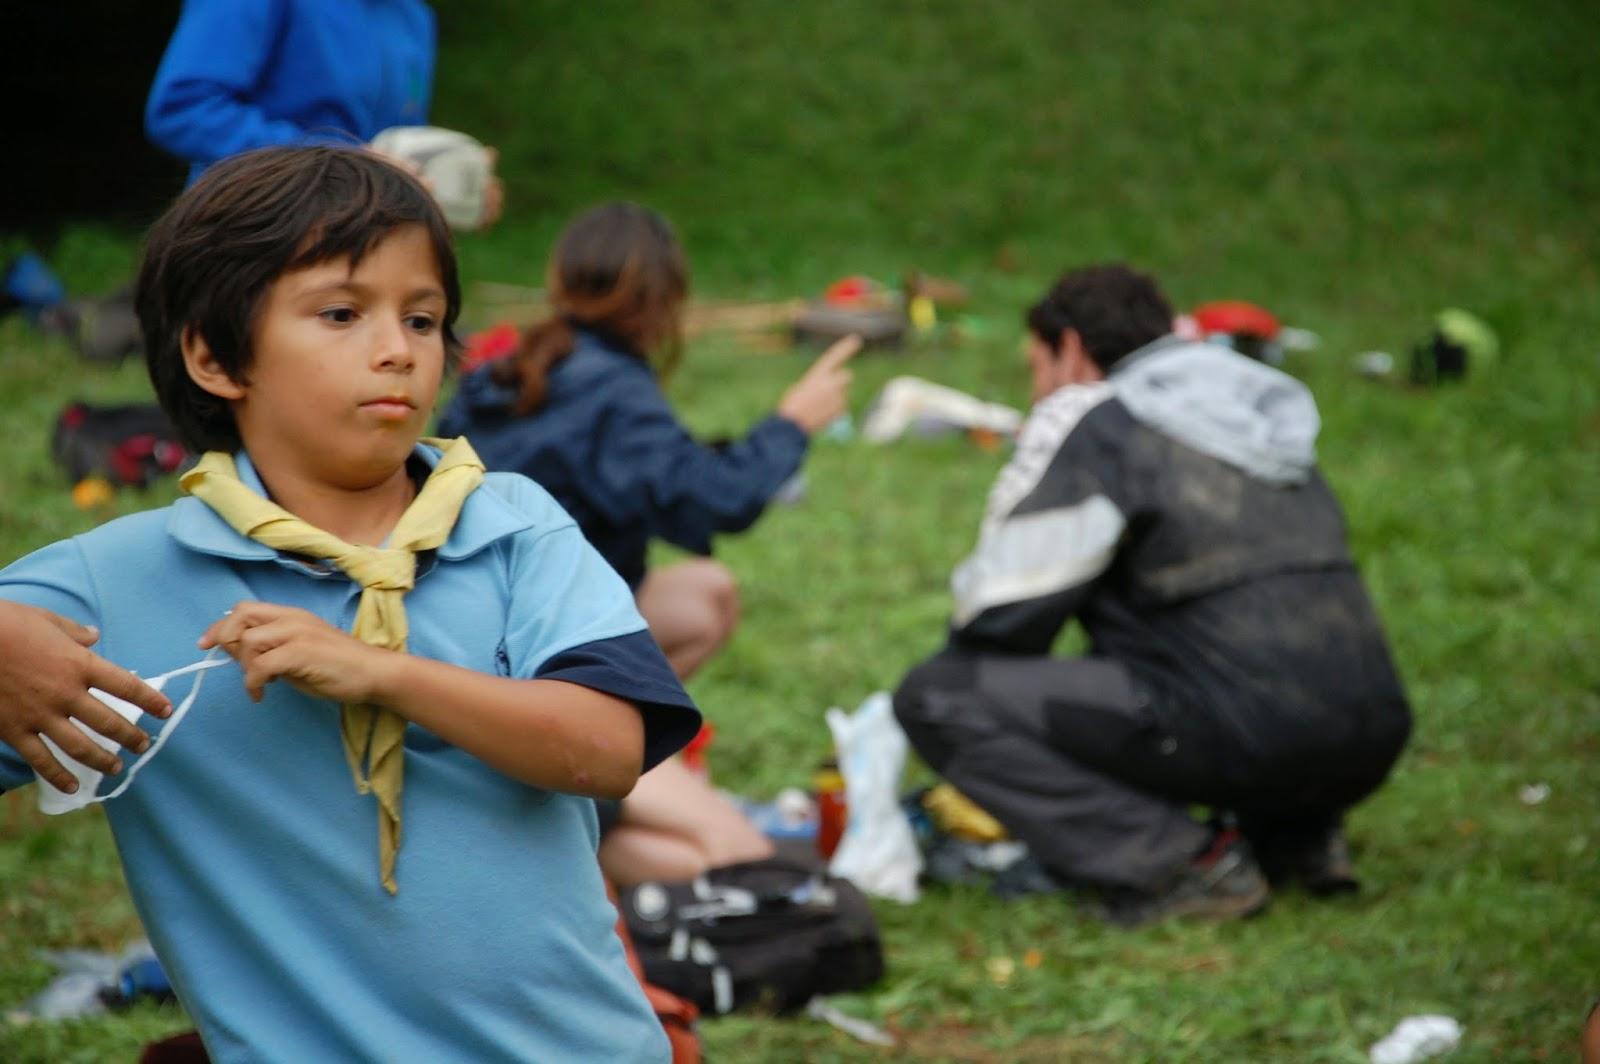 Campaments Estiu RolandKing 2011 - DSC_0275%2B2.JPG